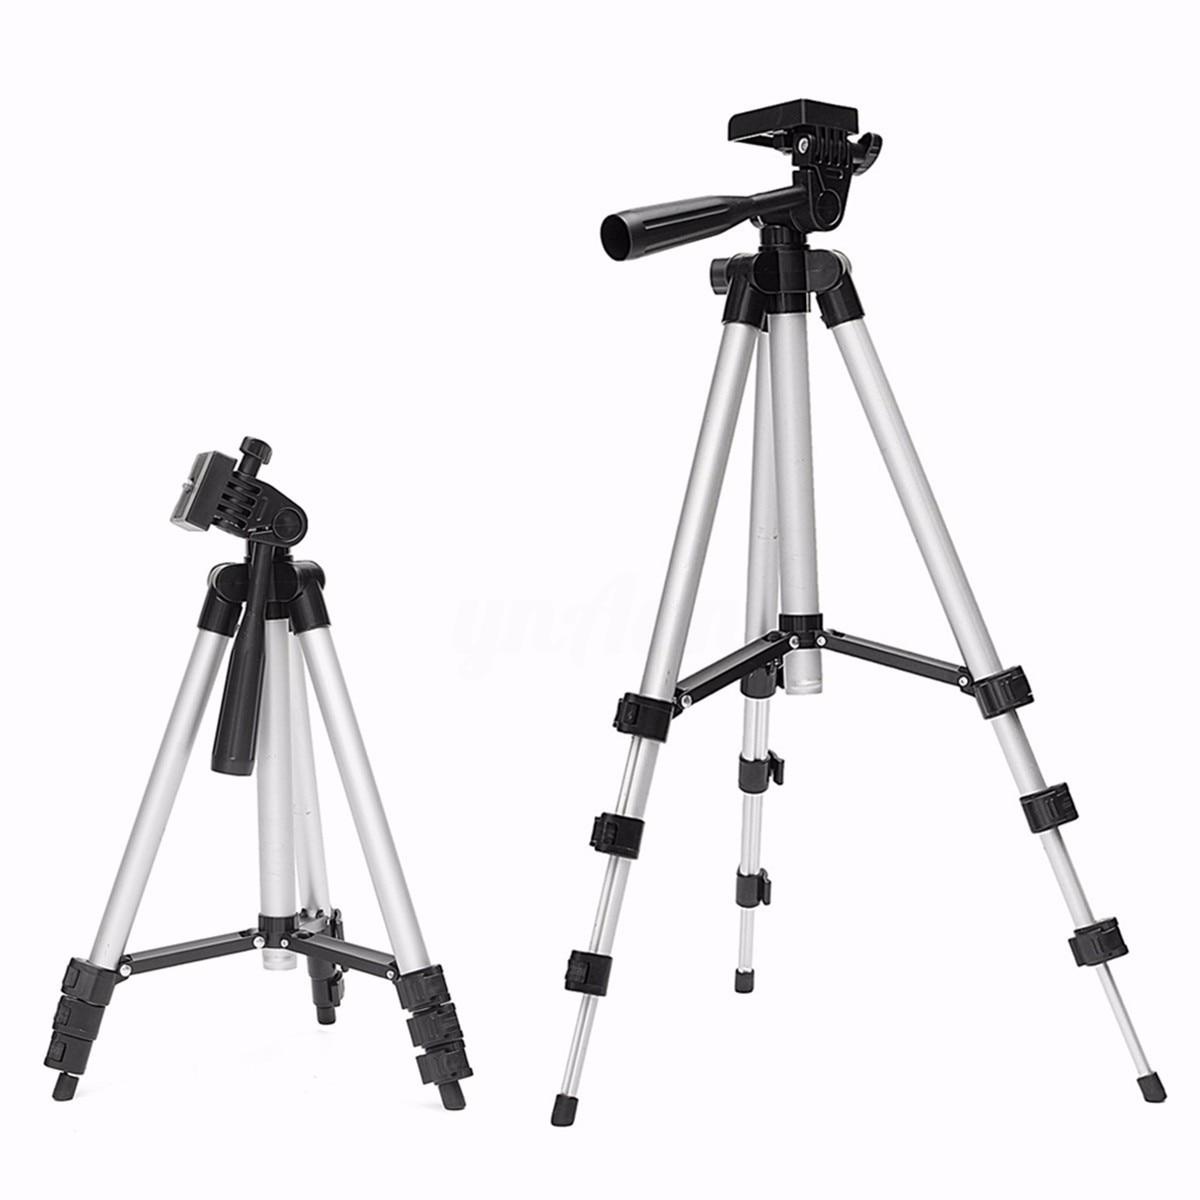 Universal Lightweight Aluminum Mini Tripod 4 Sections Camera Tripod Camera Stand Photo Tripod Gorillapod Tripe 29-65cm